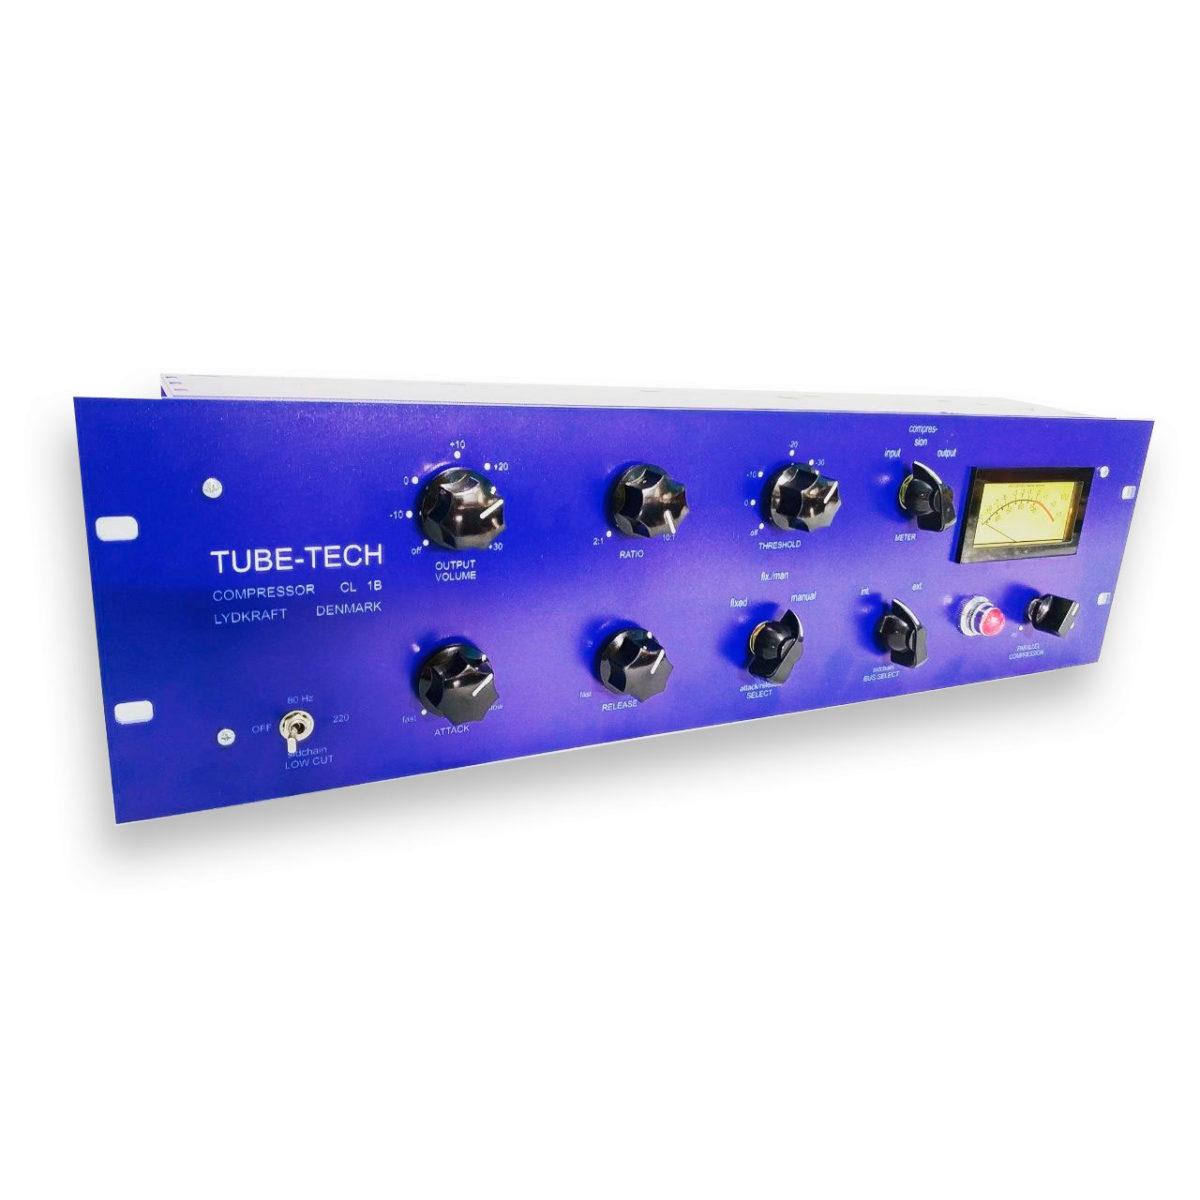 Tube Tech Midi Controller